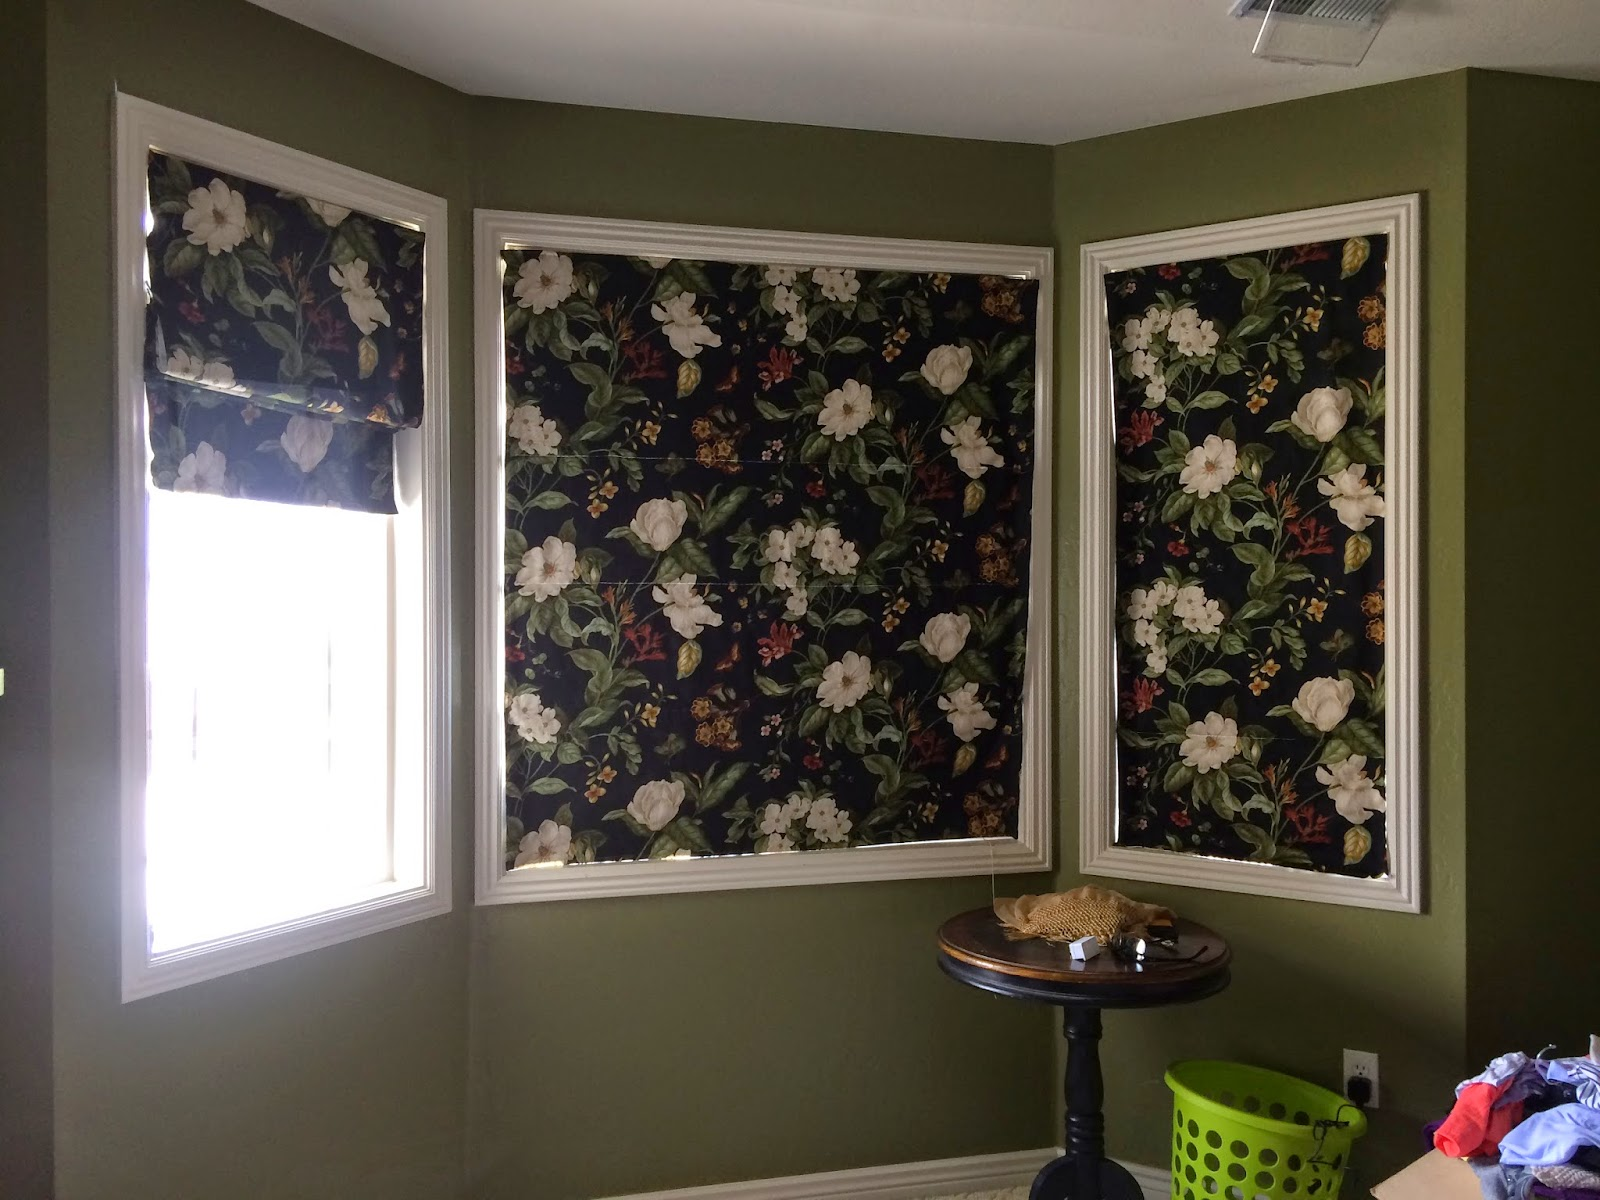 blinds budget wood services window ology treatments utah